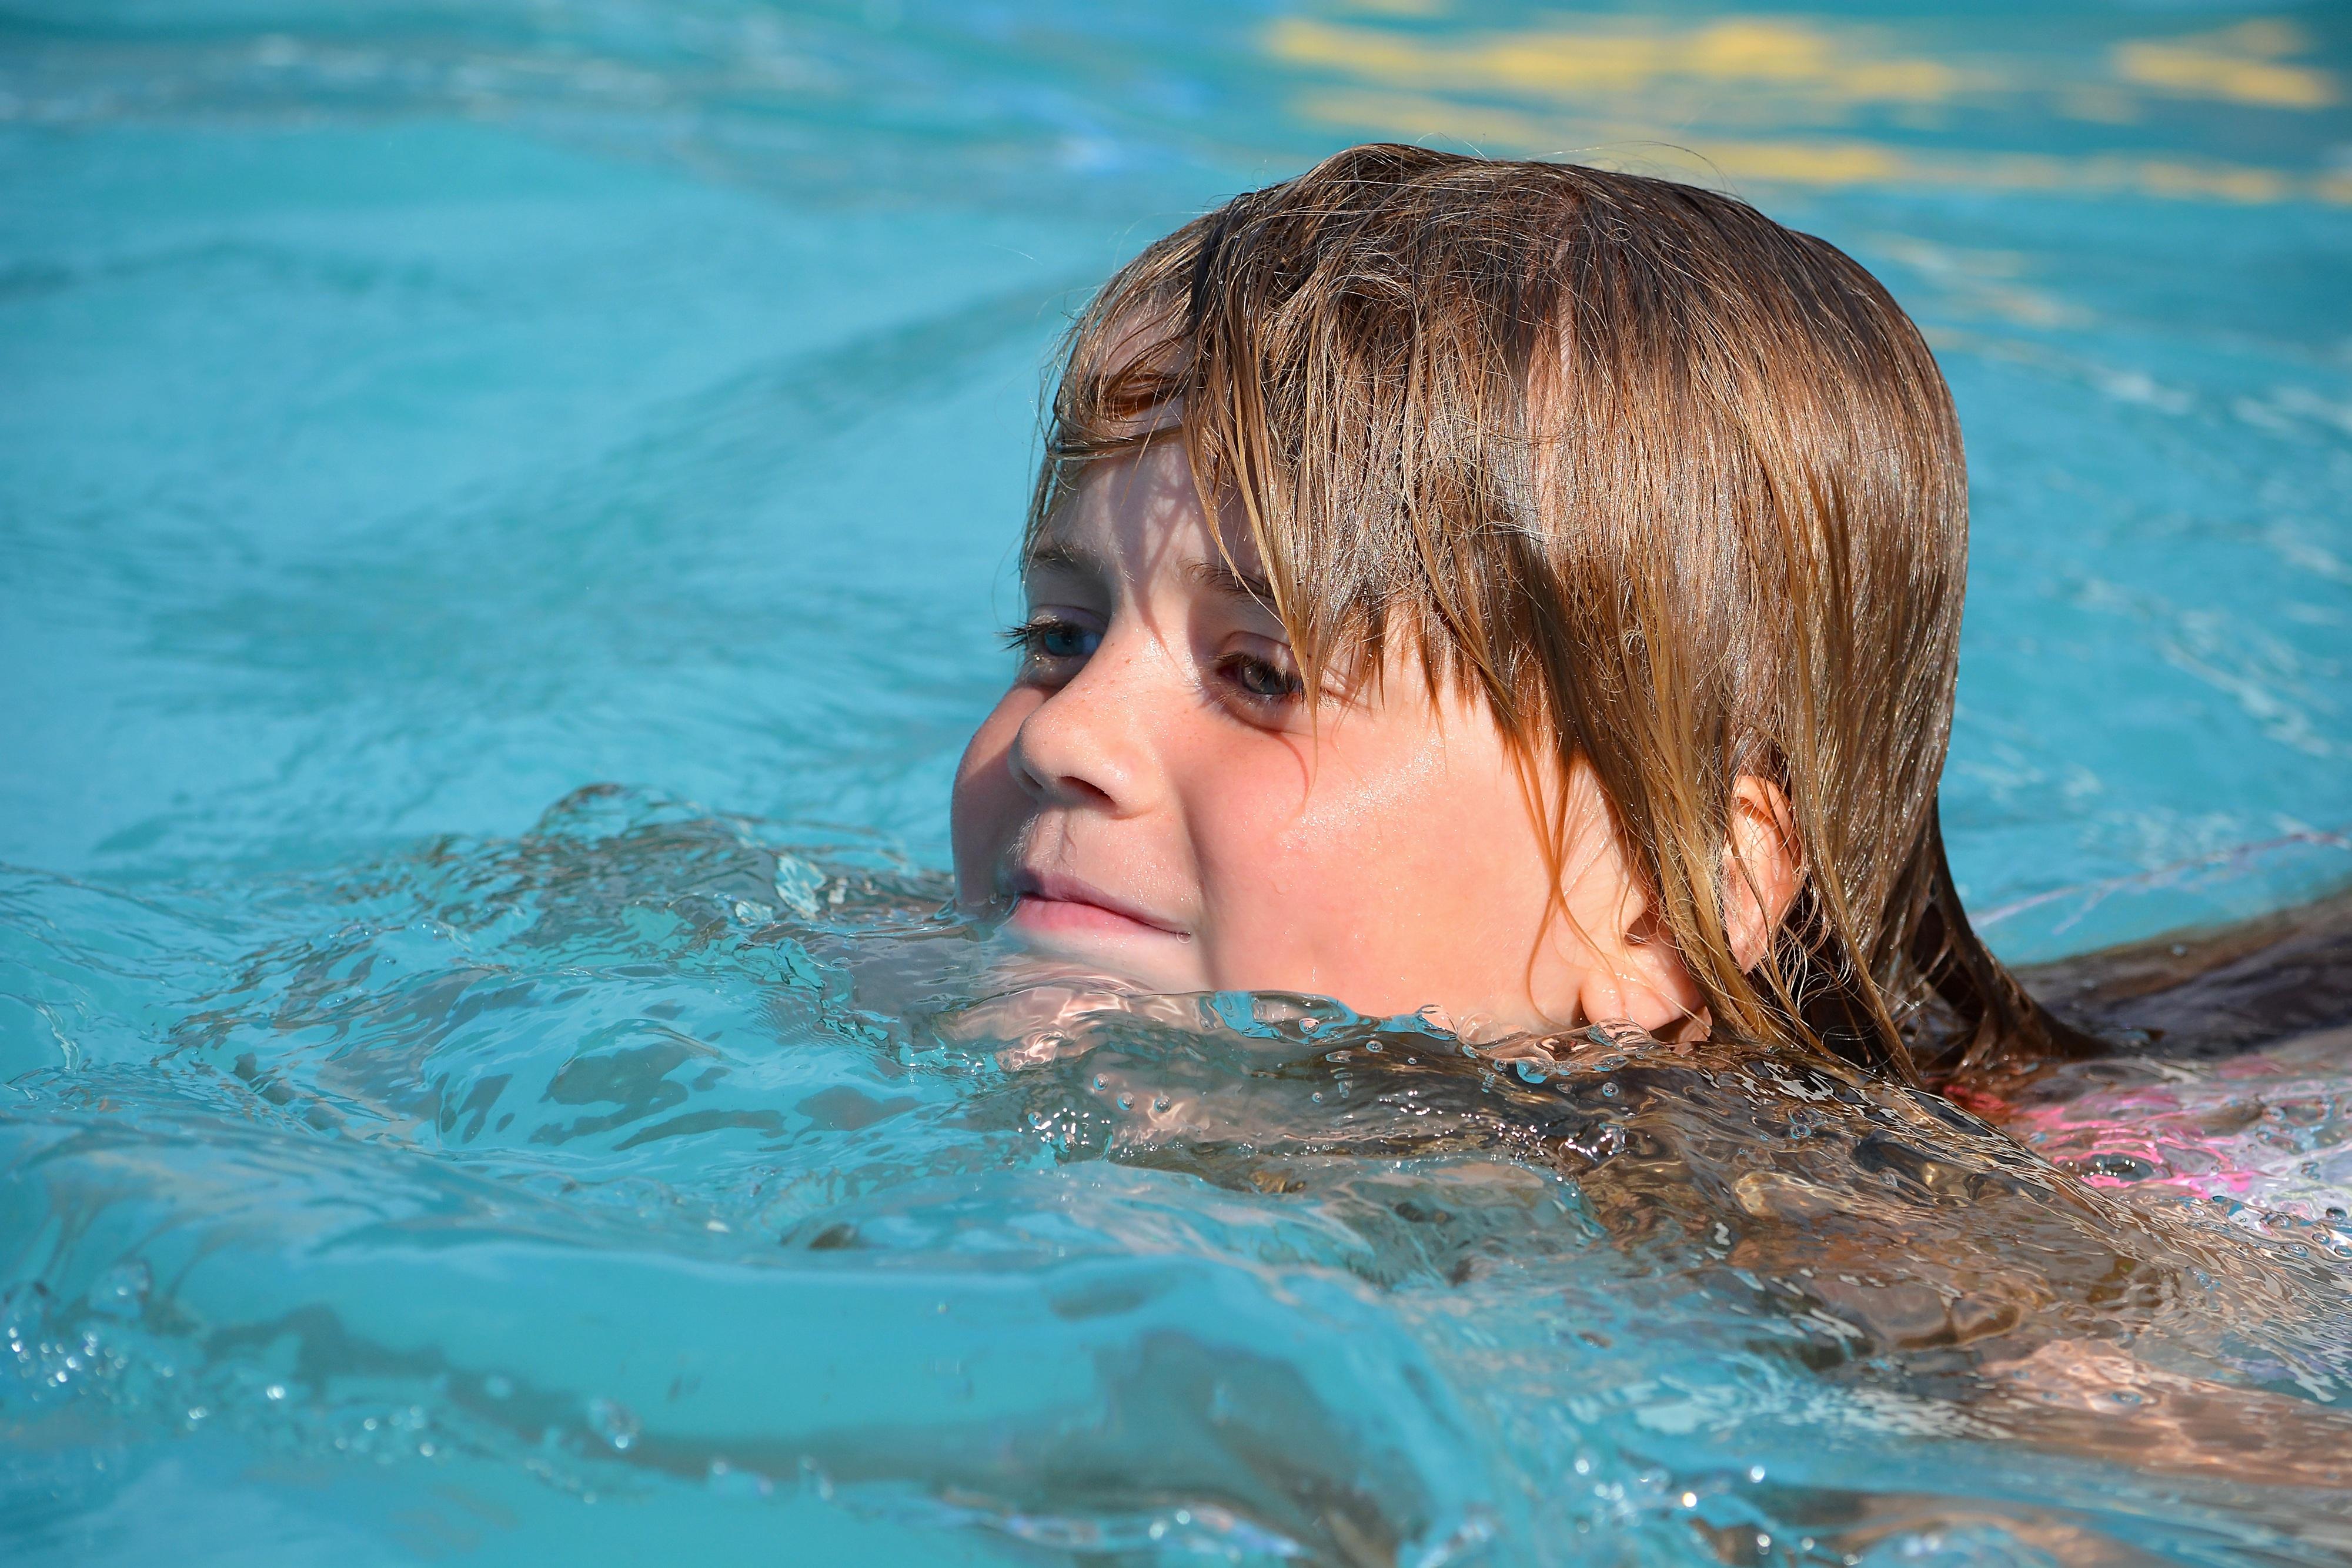 Fotos Gratis Mar Agua Mojado Nadar Piscina Ni 241 O